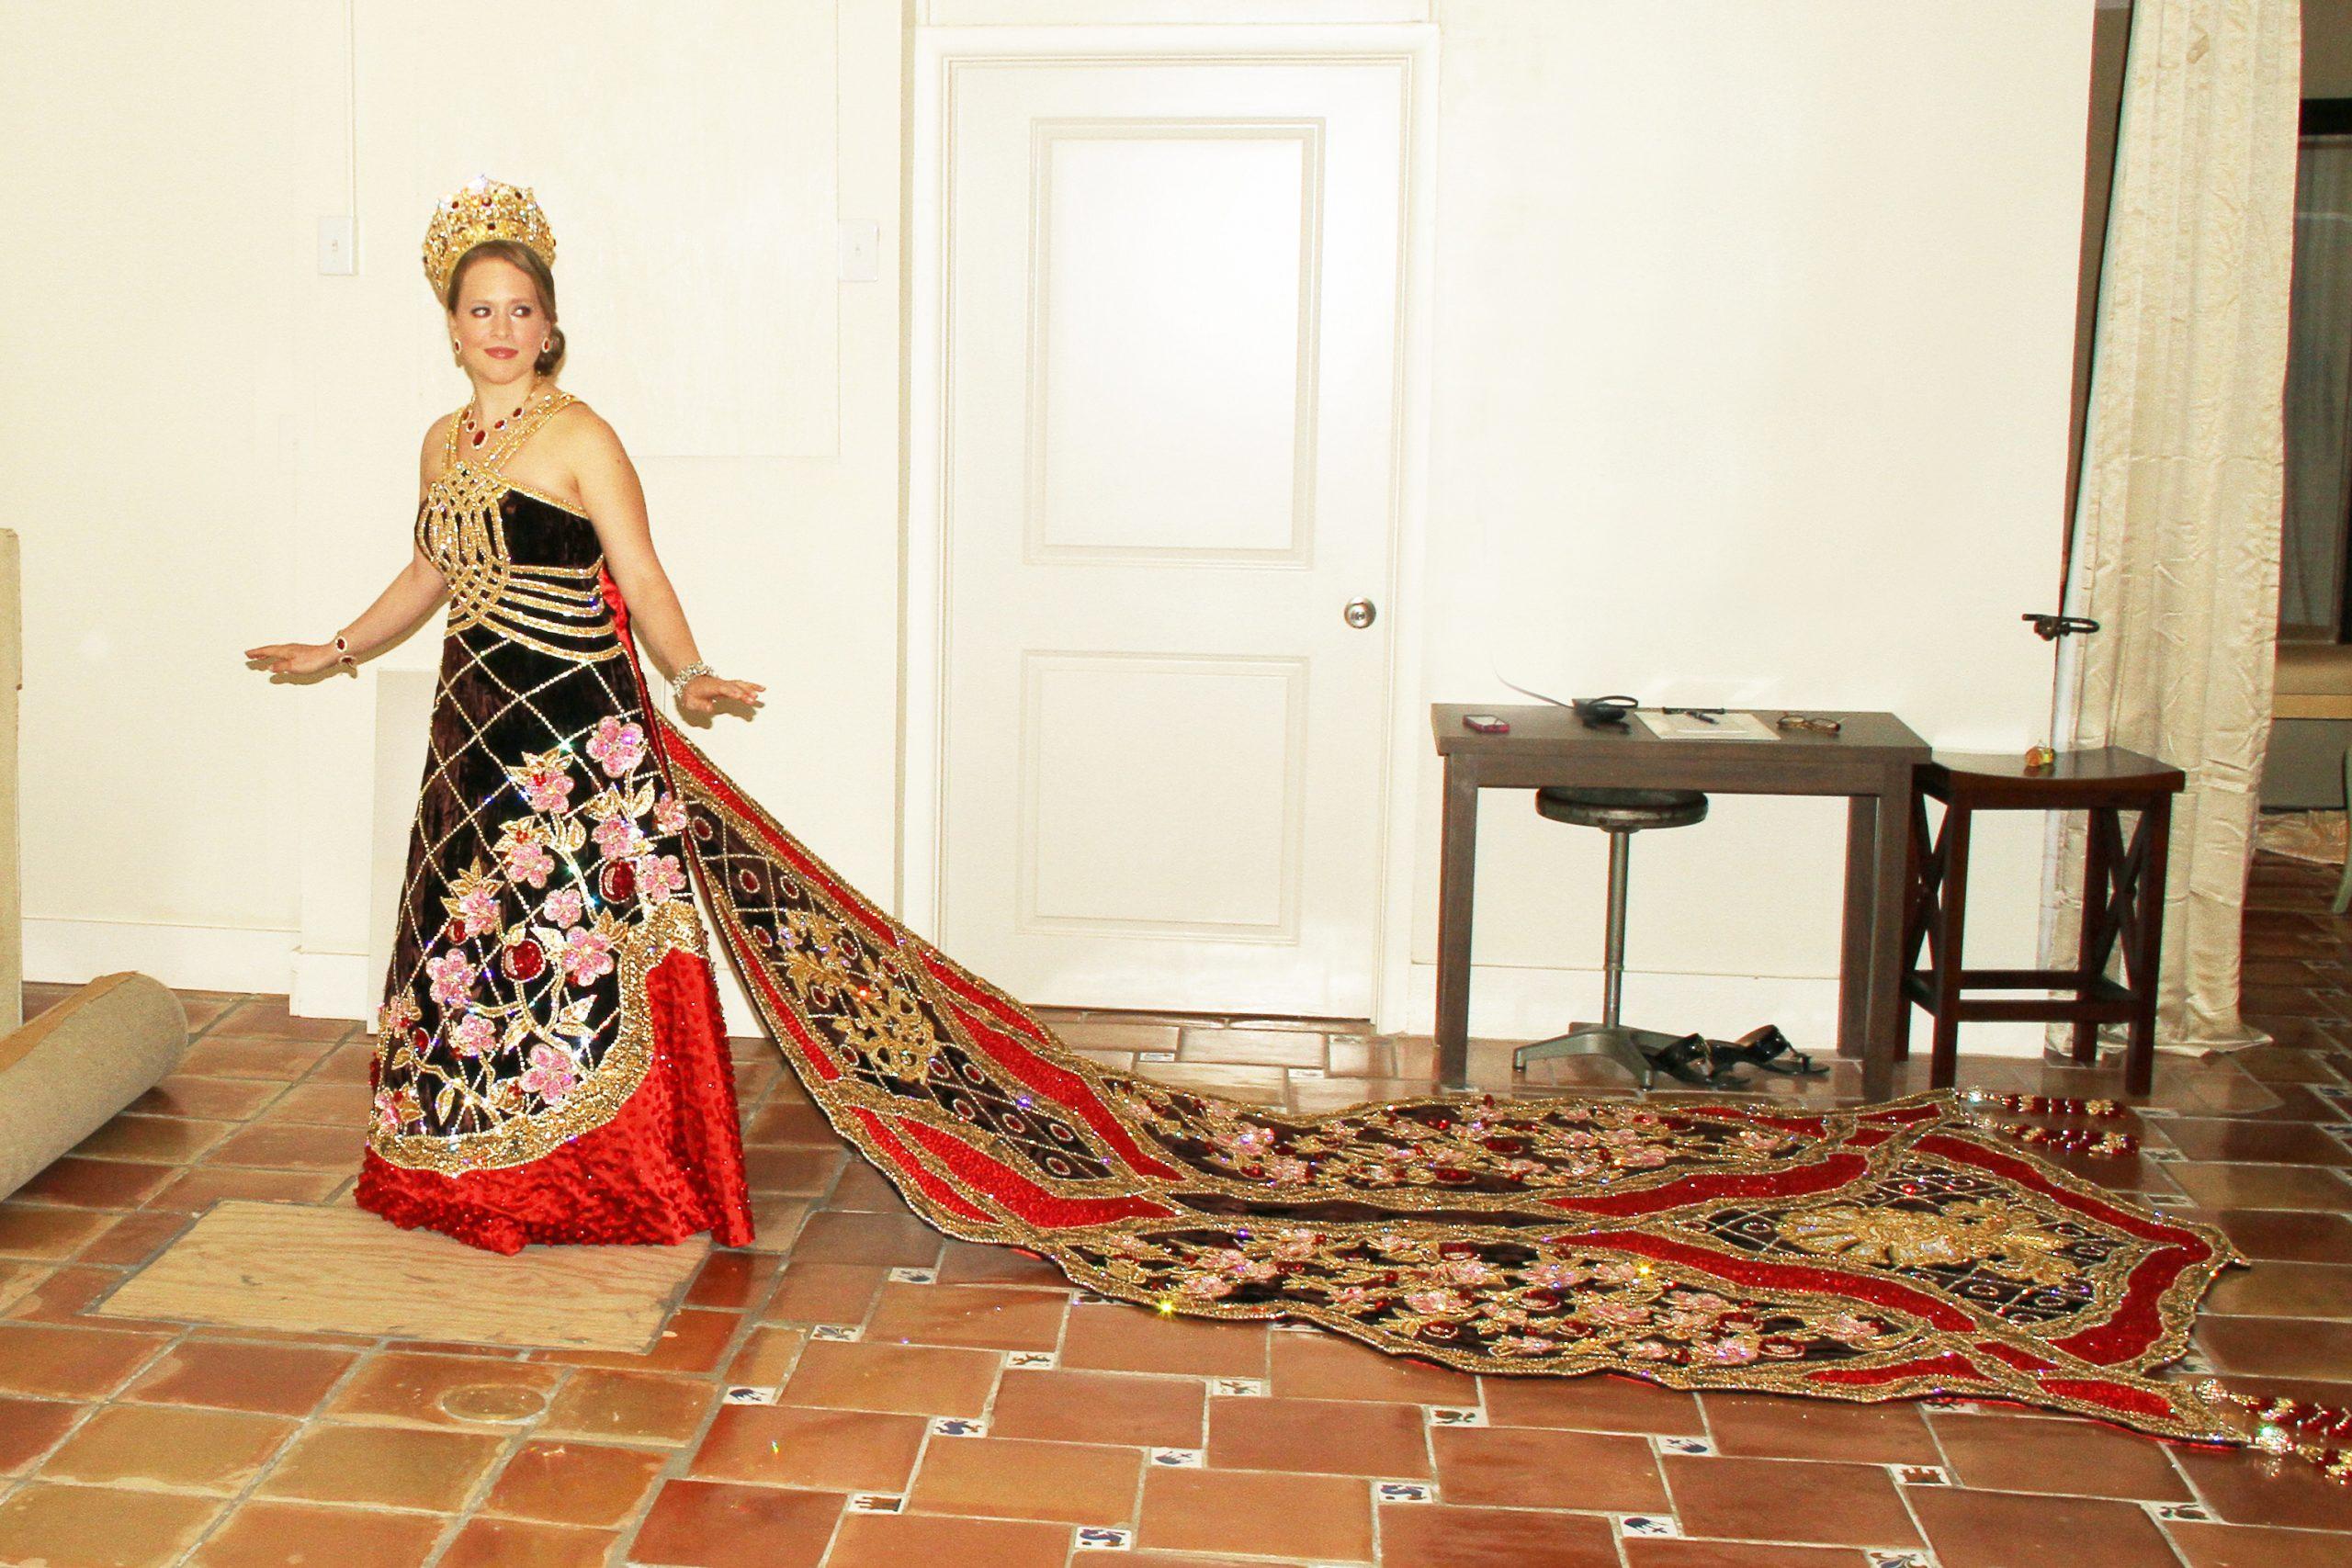 Jennifer practices walking in her elaborate coronation dress. Photo by Gary Stanko of Billo Smith Studios.